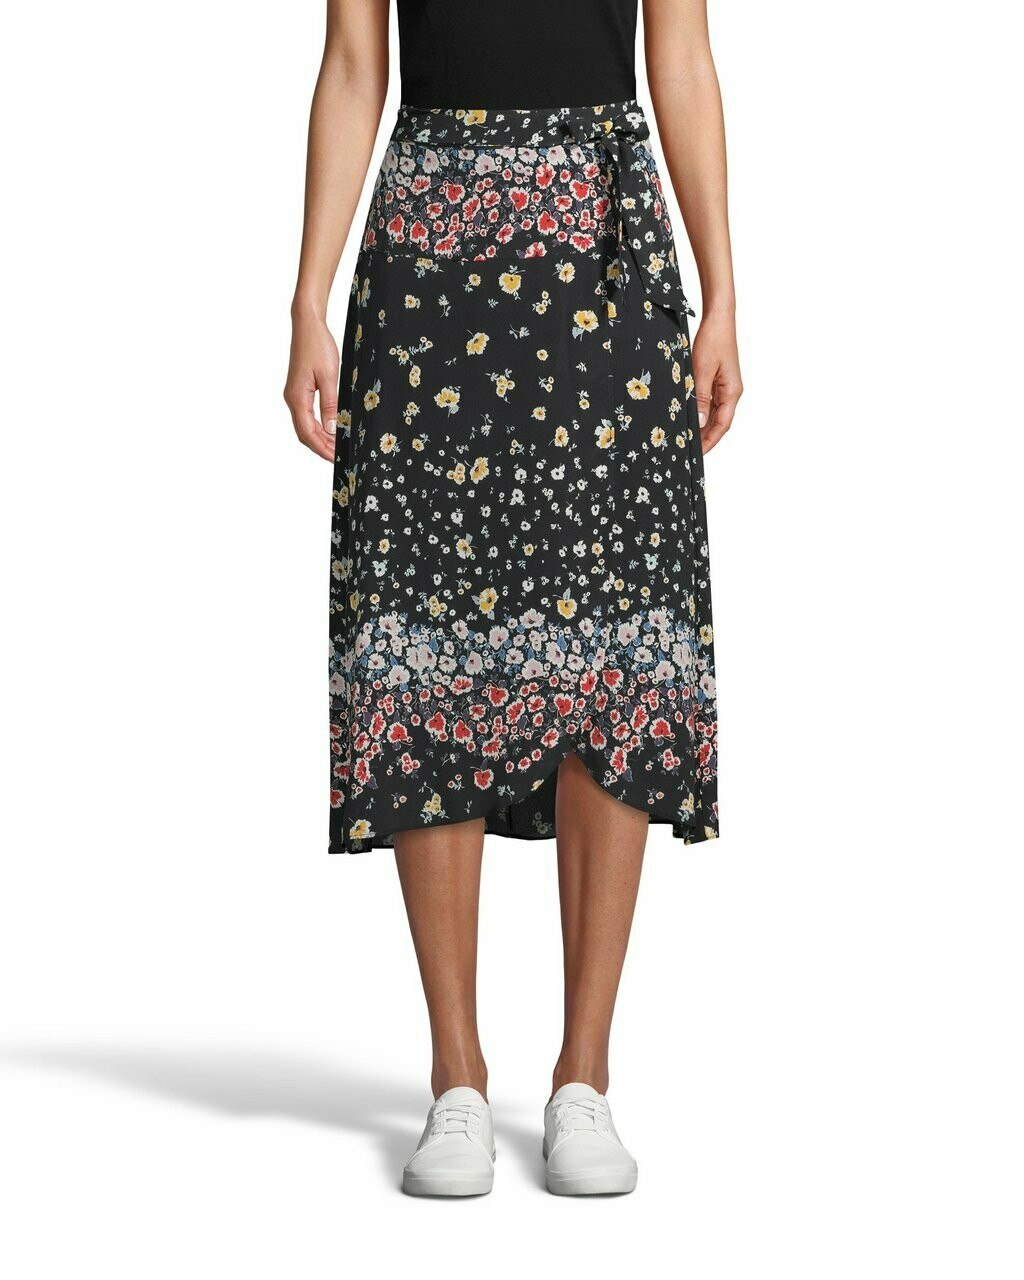 Ashbury Wrap Skirt